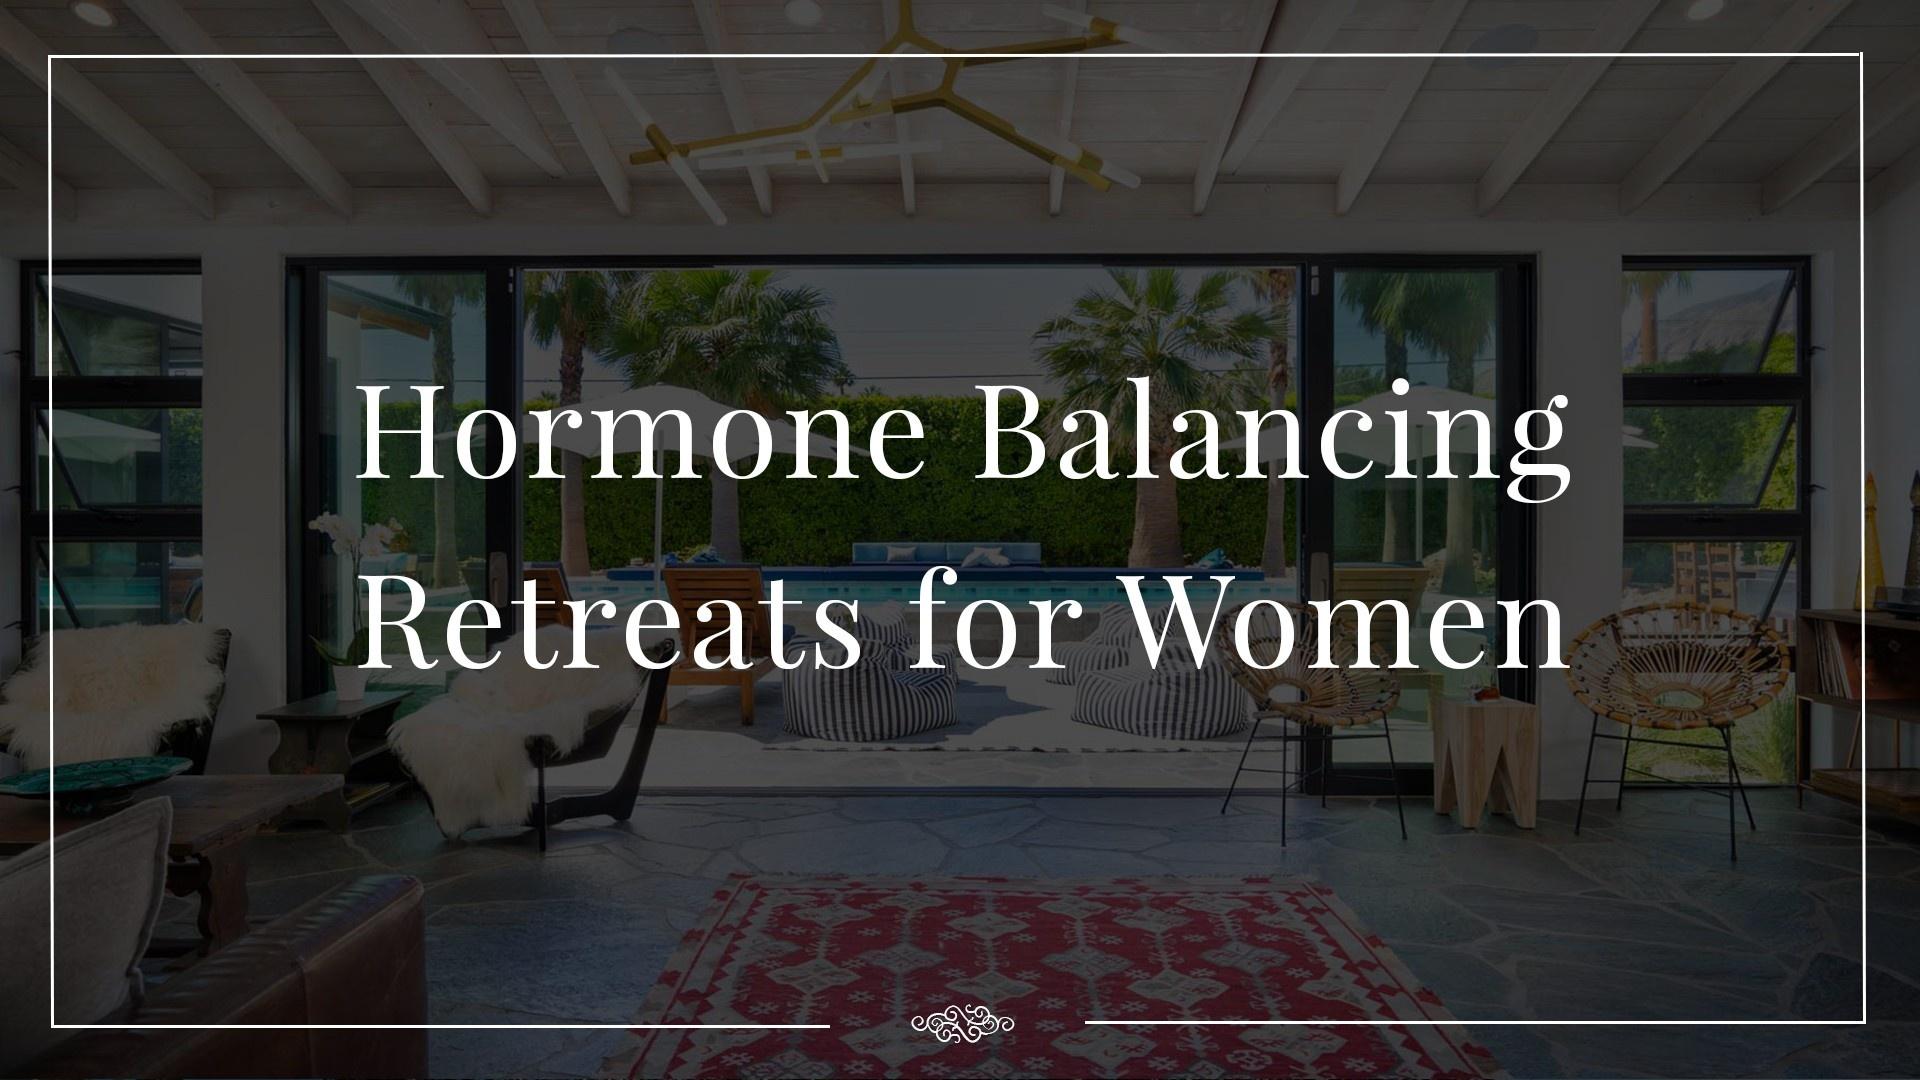 Hormone Balancing Retreats